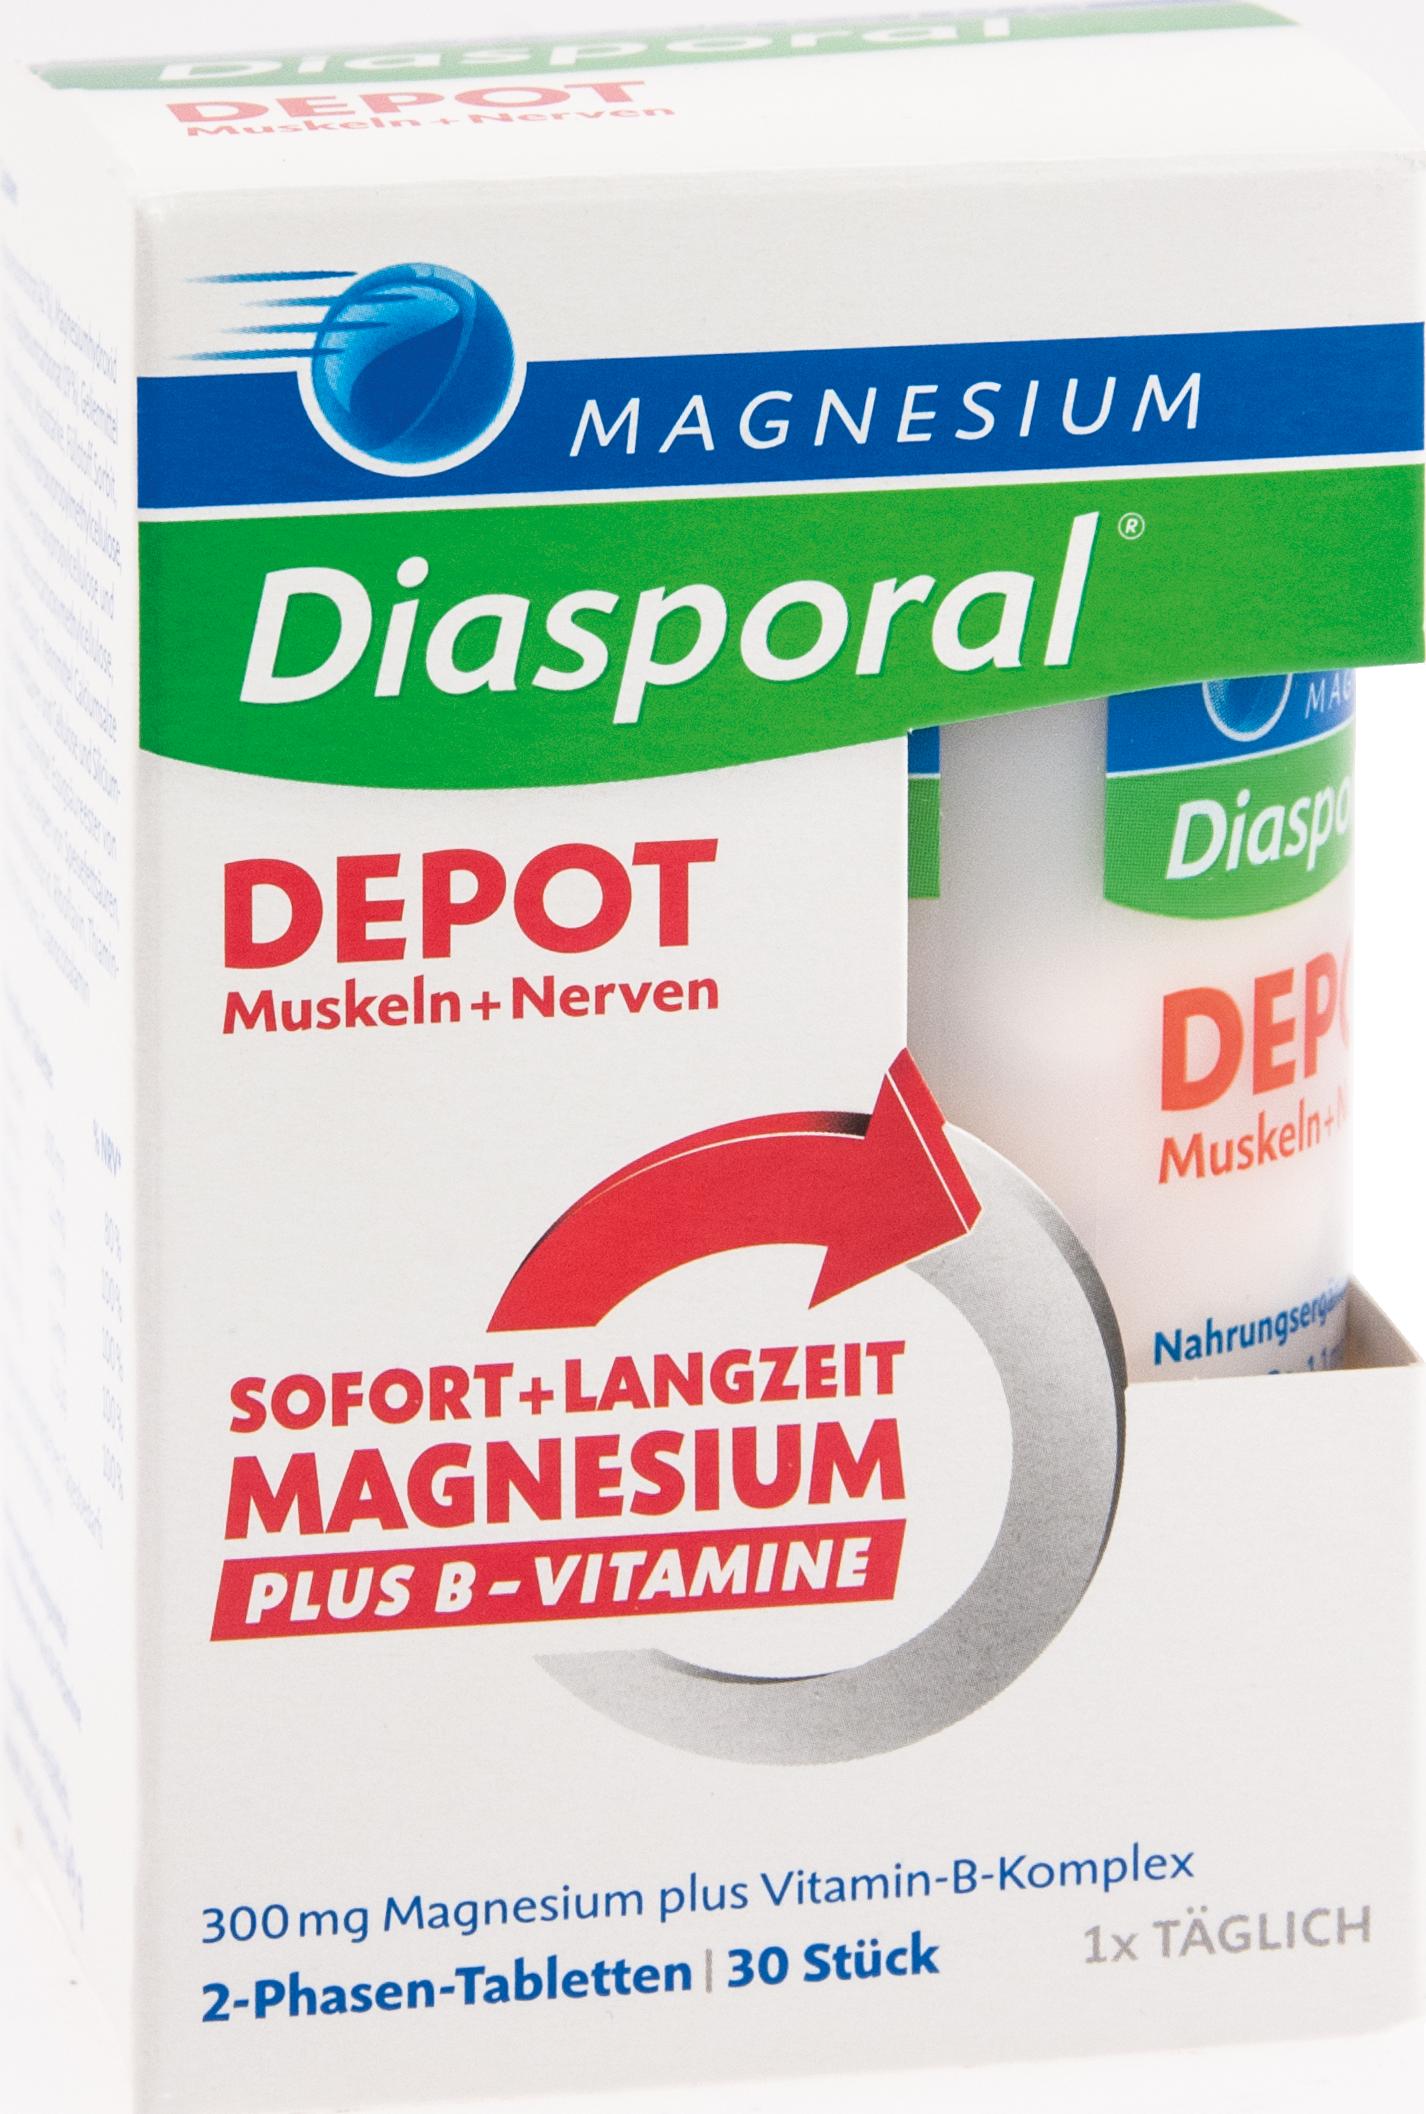 Magnesium-Diasporal DEPOT Muskeln + Nerven